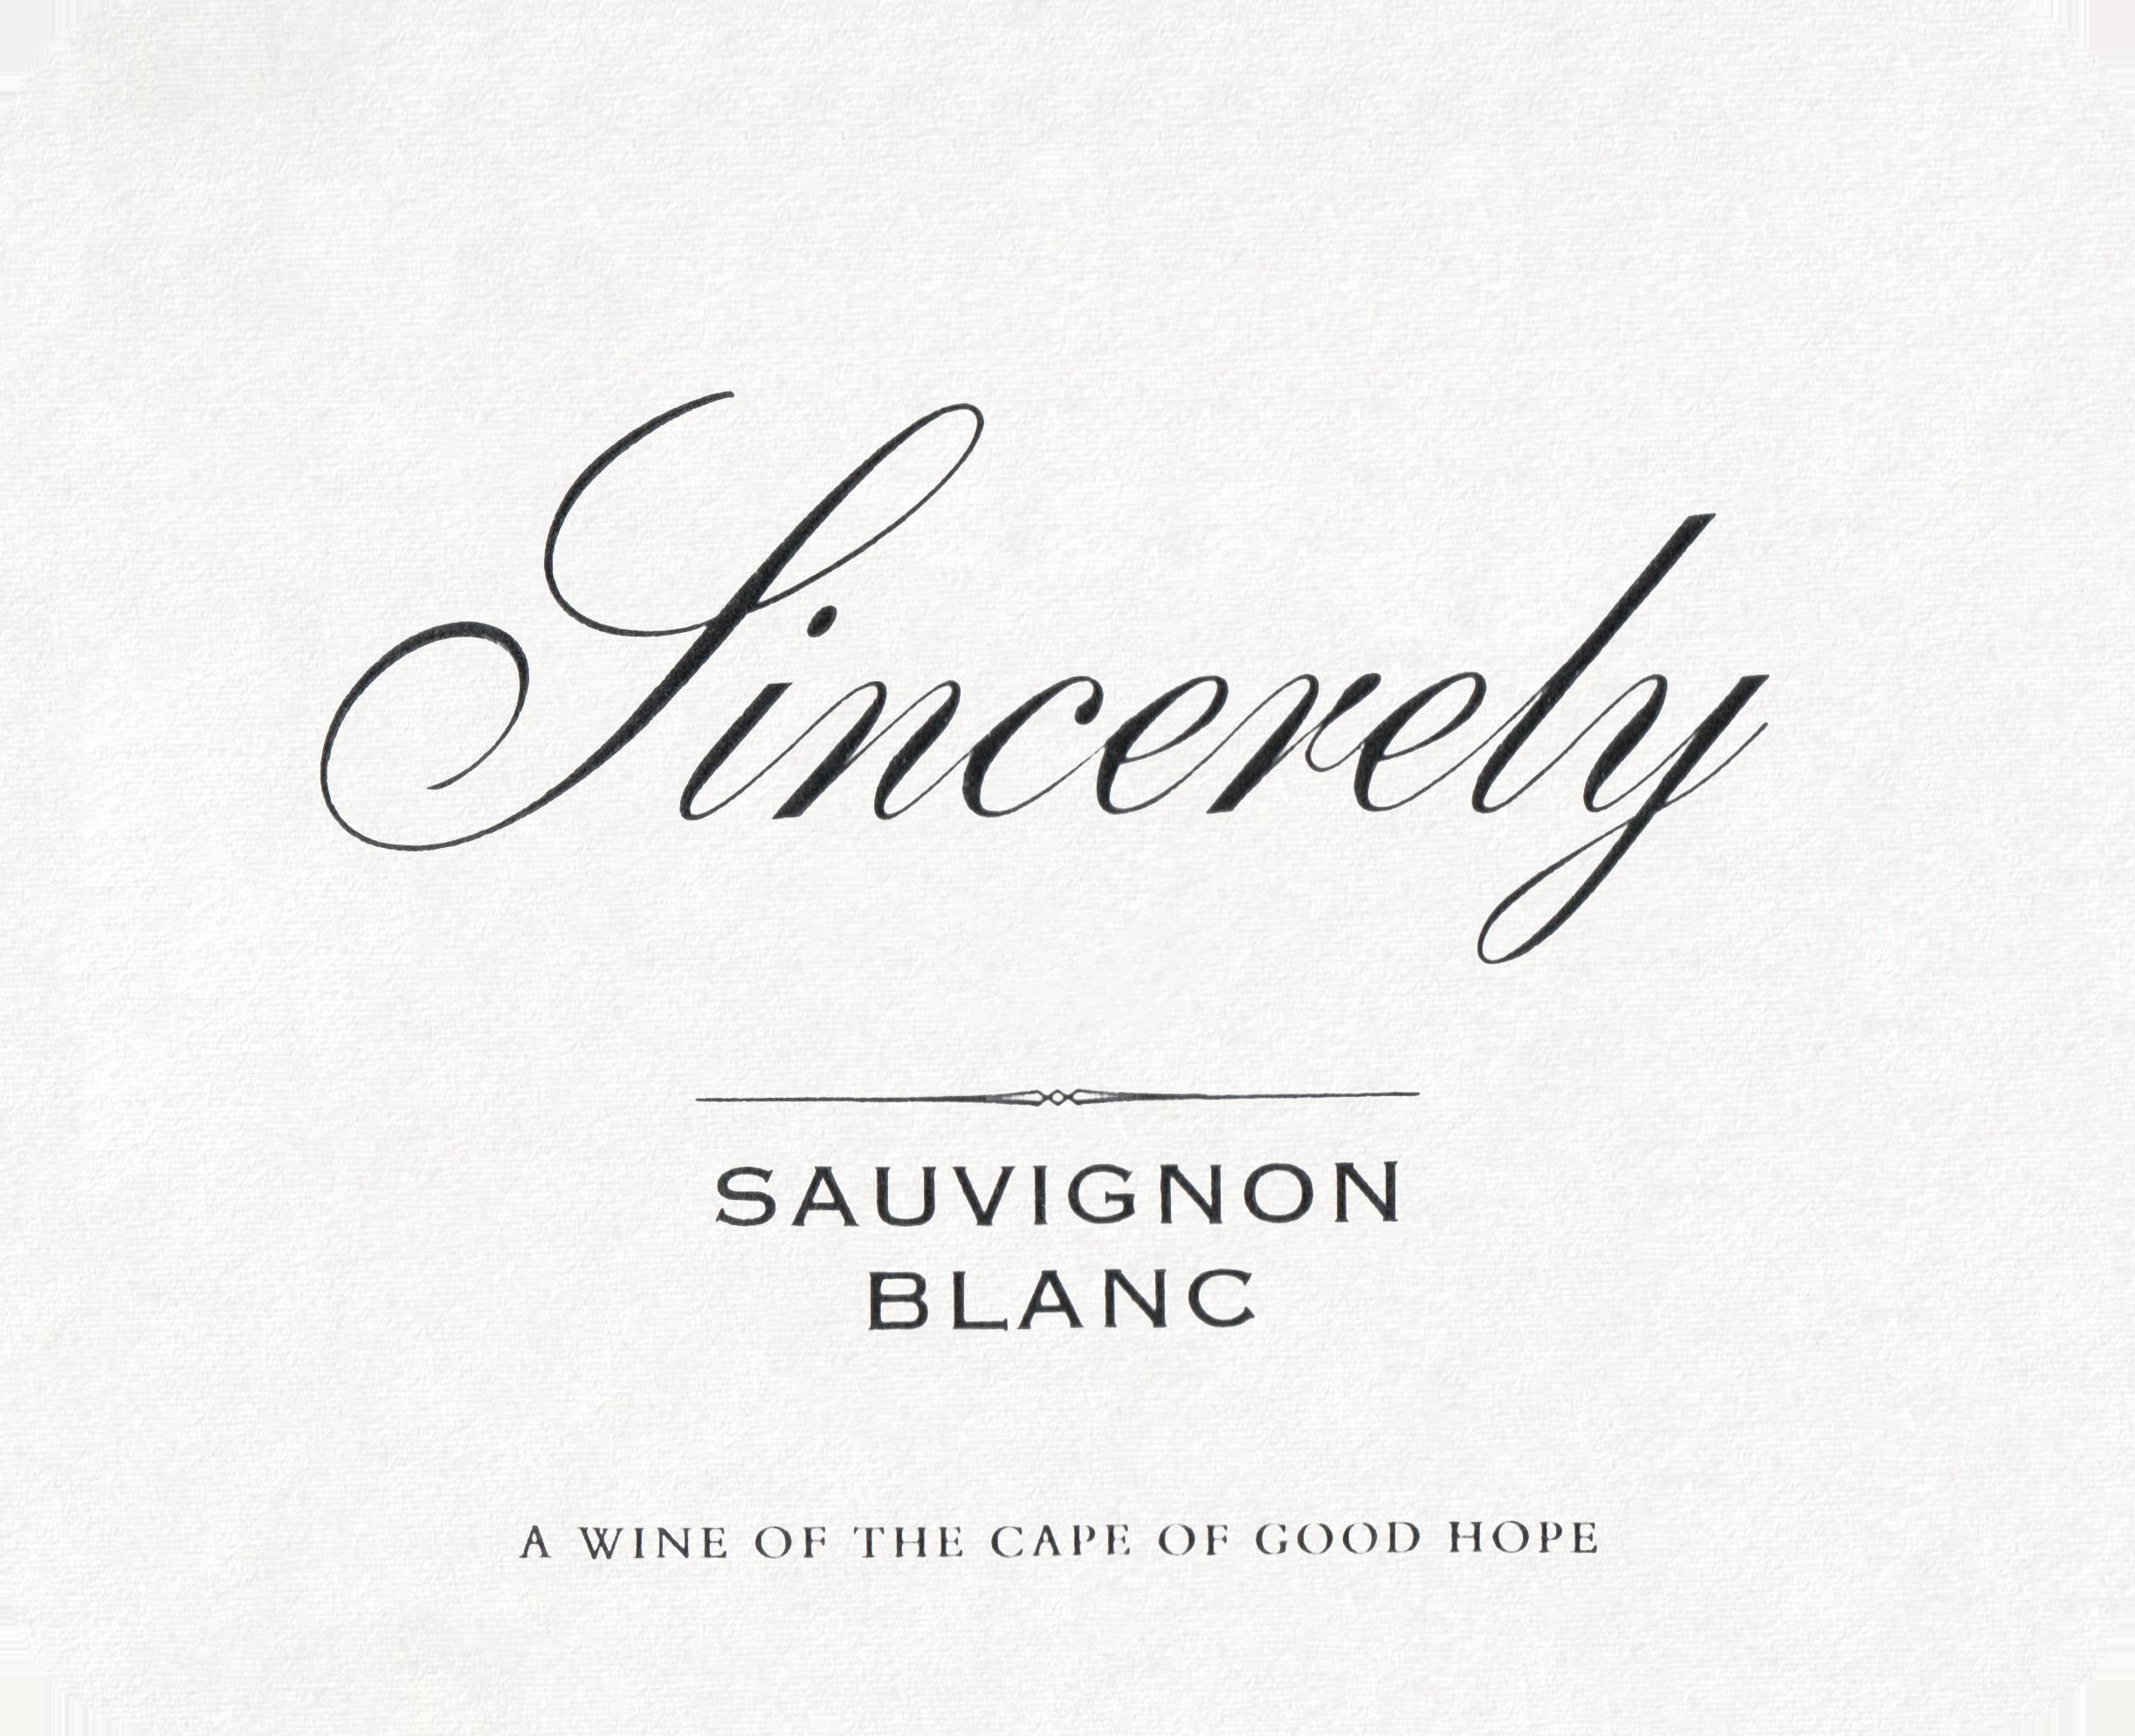 Neil Ellis Sincerely Sauvignon Blanc 2019